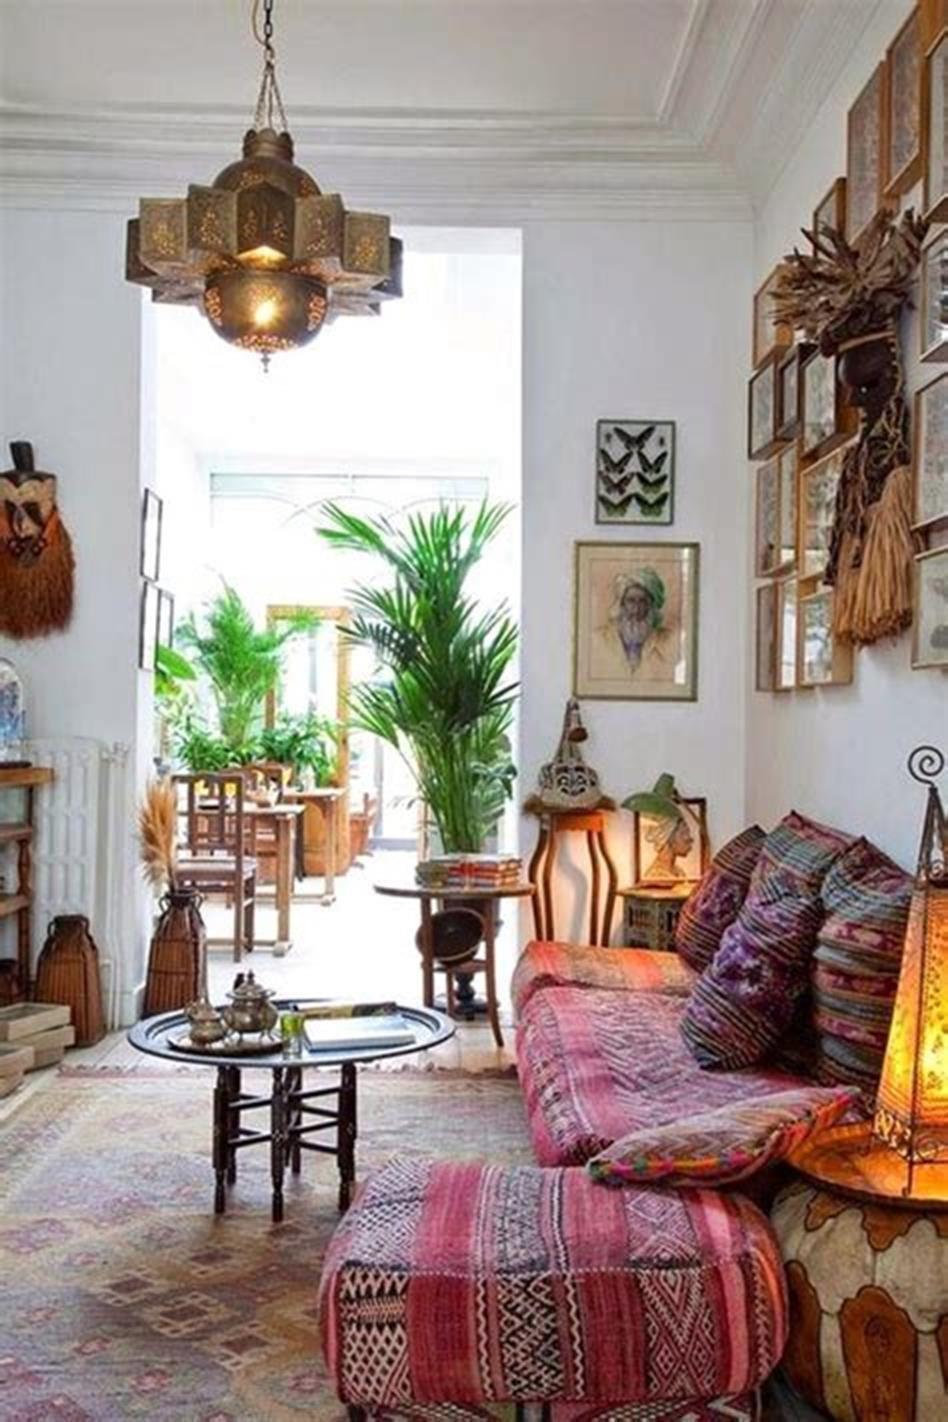 35 stunning boho bohemian living room ideas bohemian living rooms bohemian interior design on boho chic decor living room bohemian kitchen id=40835